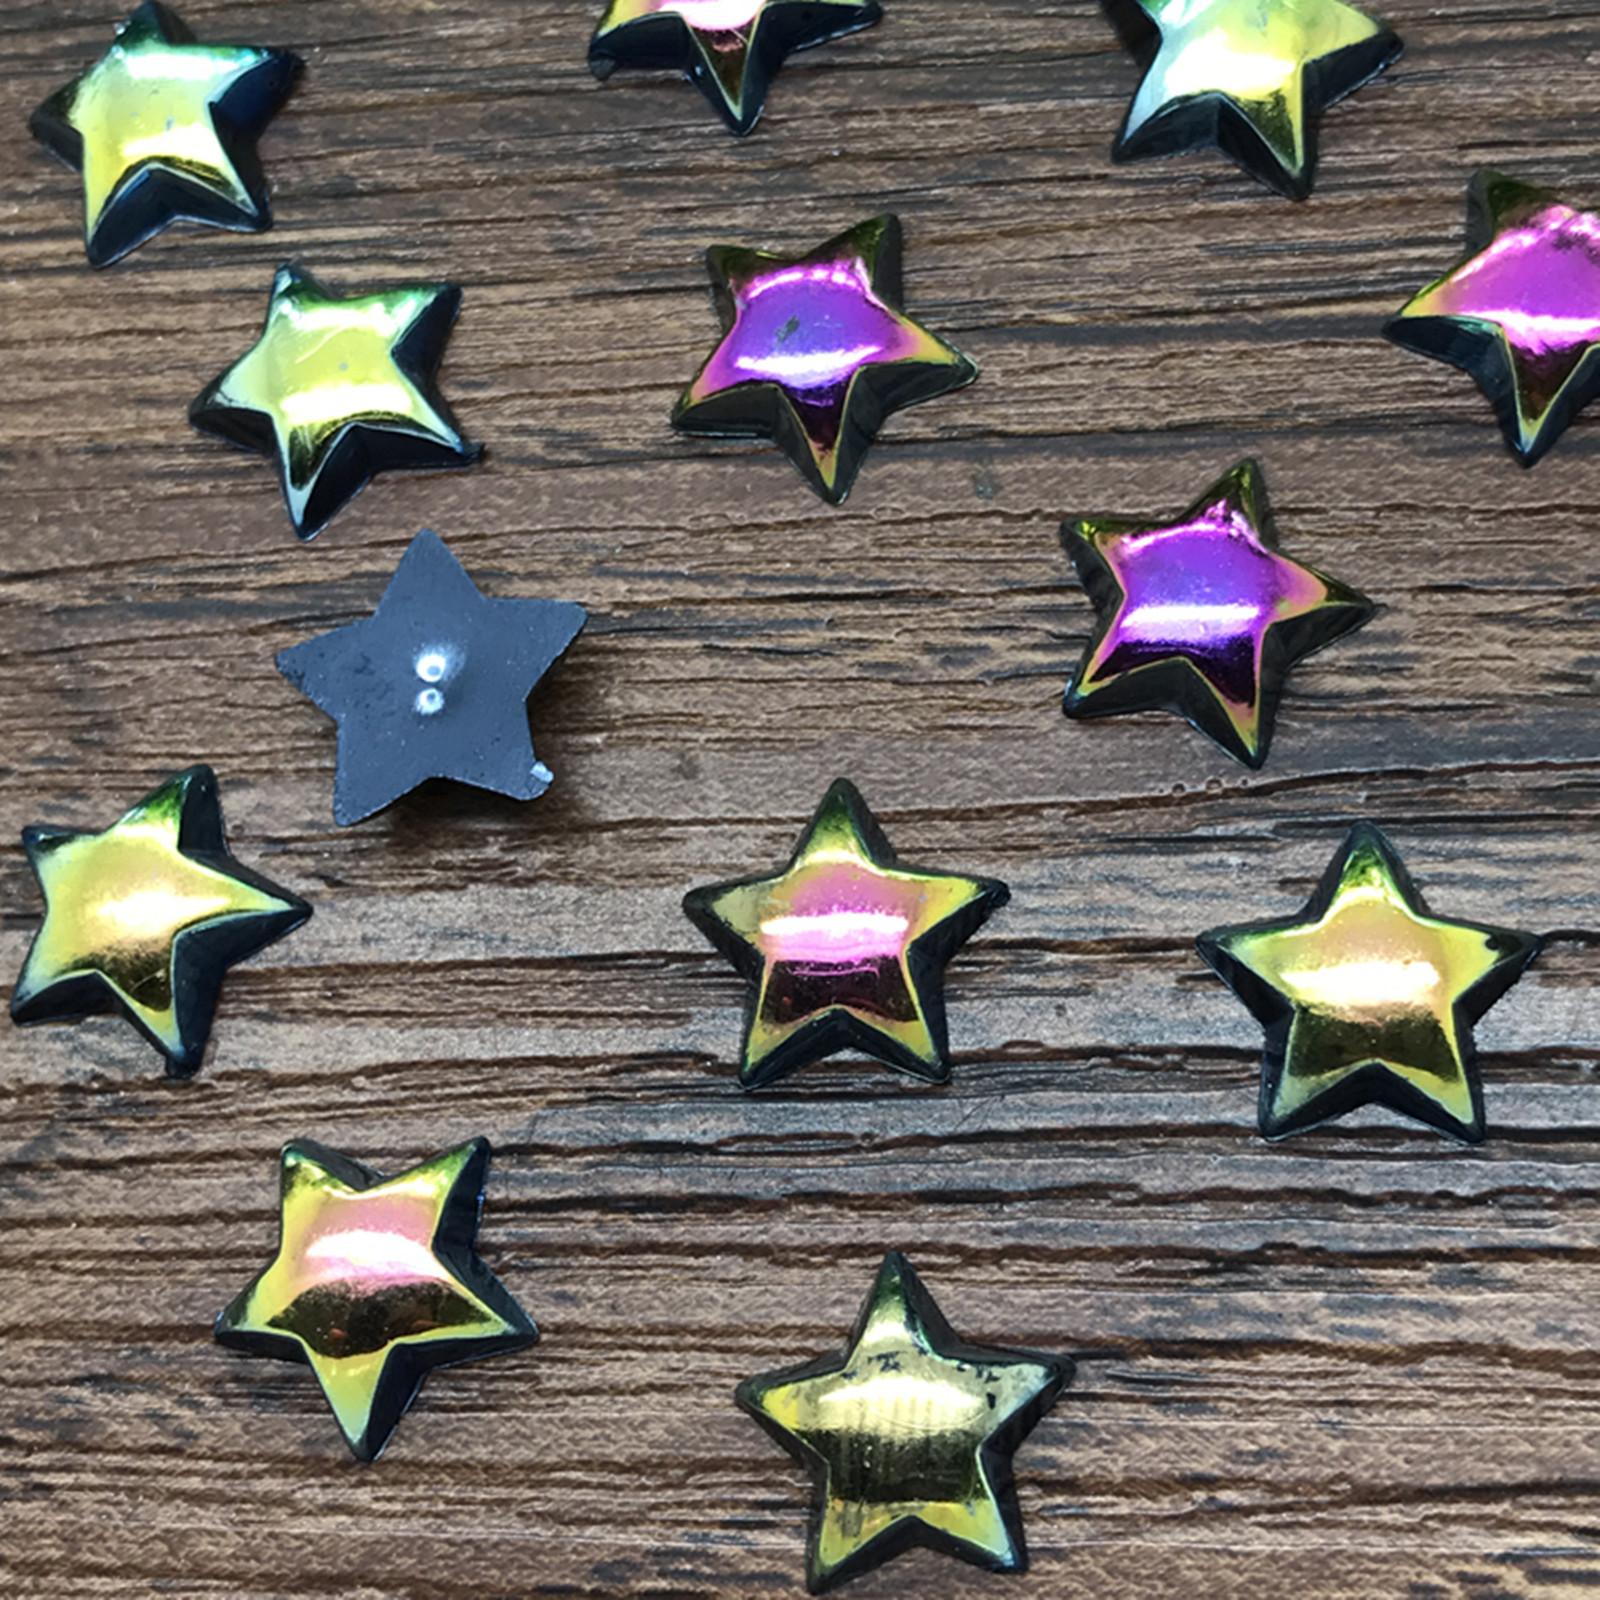 NEW DIY 10mm 100pcs smooth Resin Star Flat back Scrapbooking Craft beads mixing